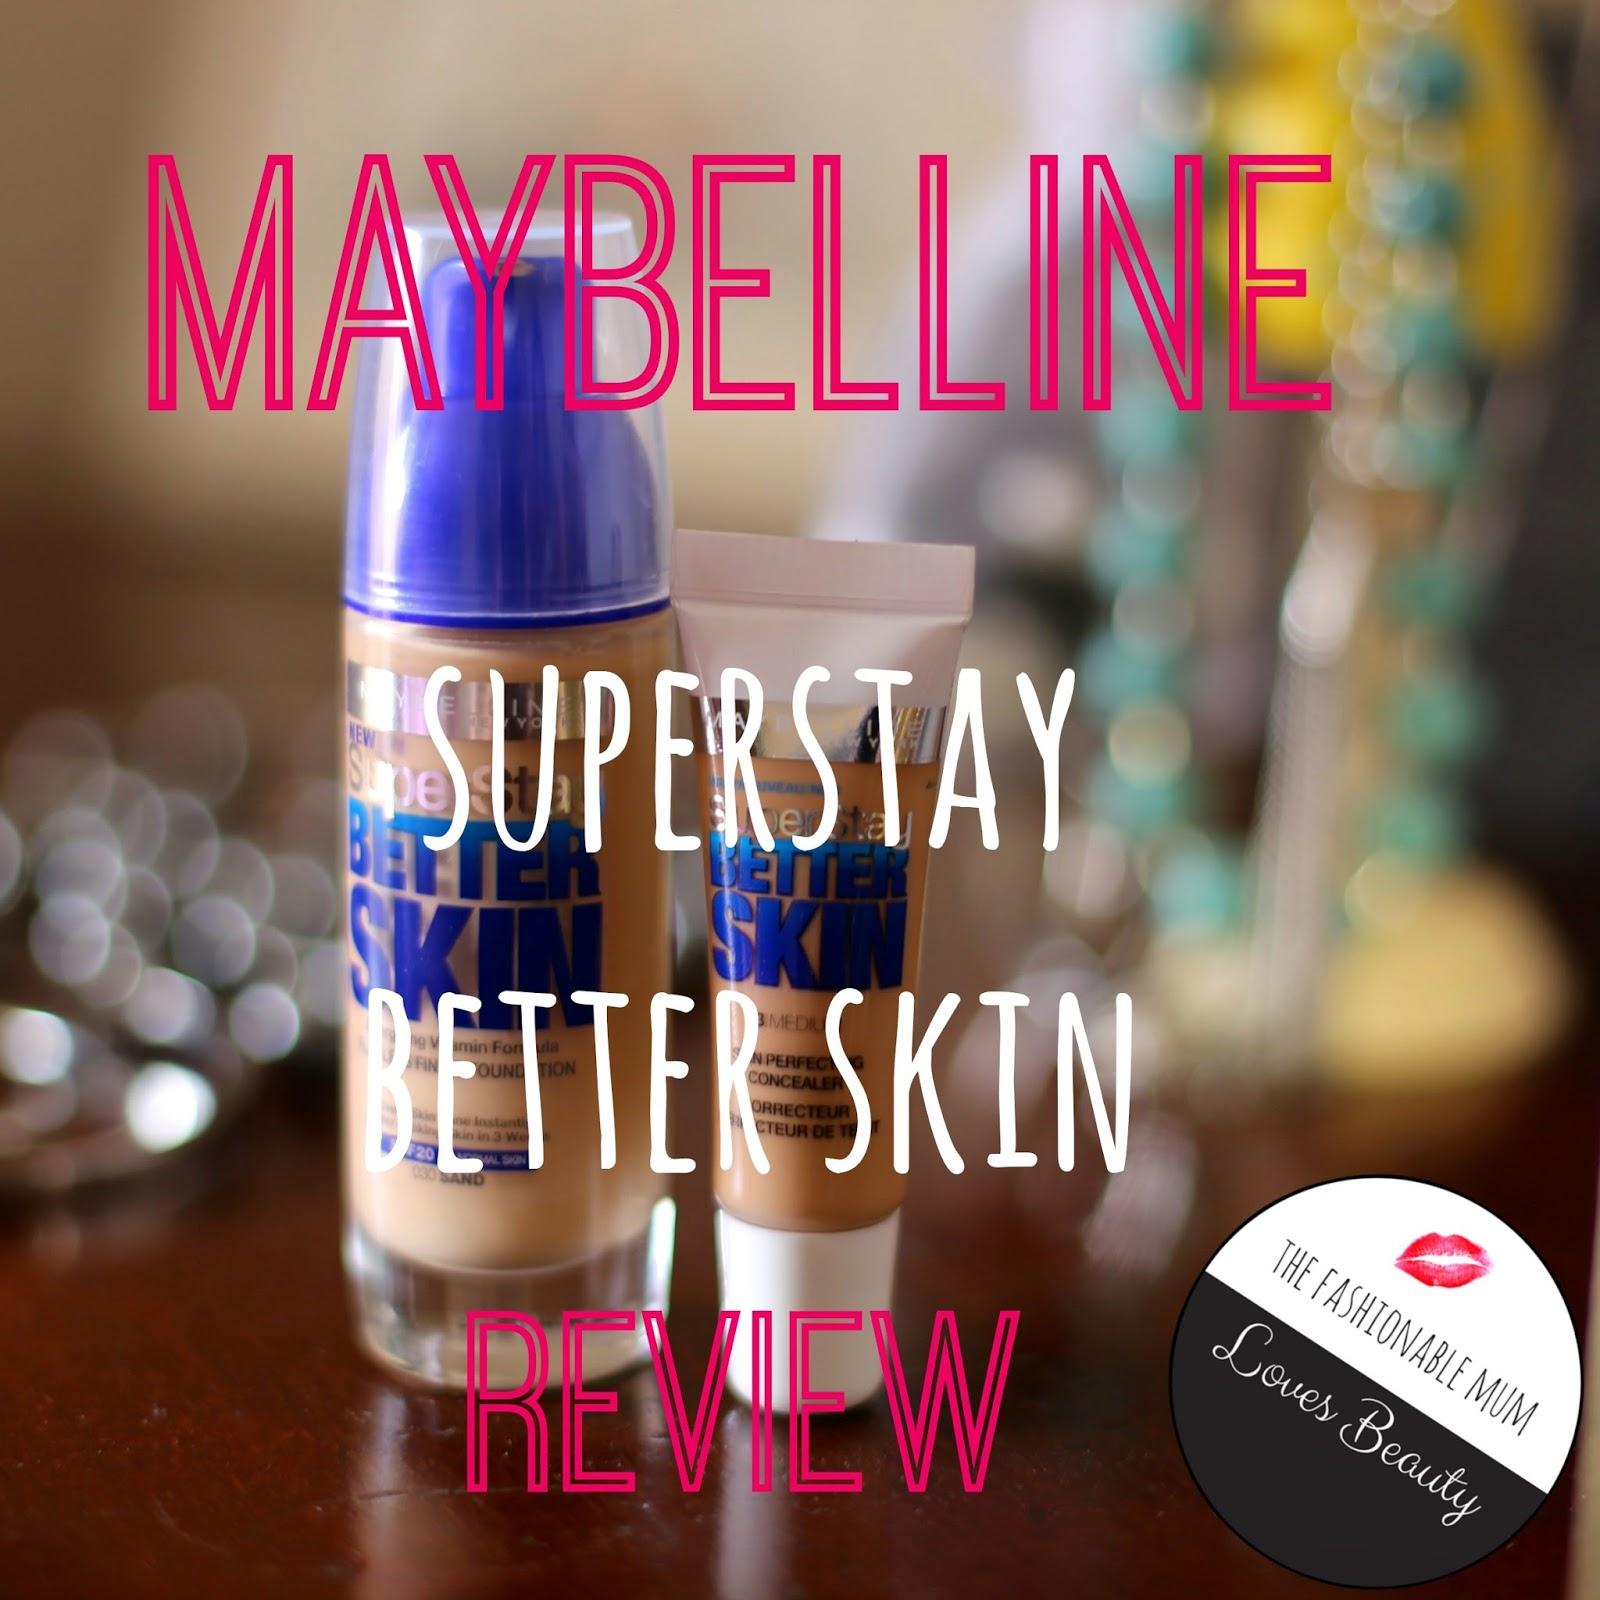 Maybelline Superstar Better Skin Foundation